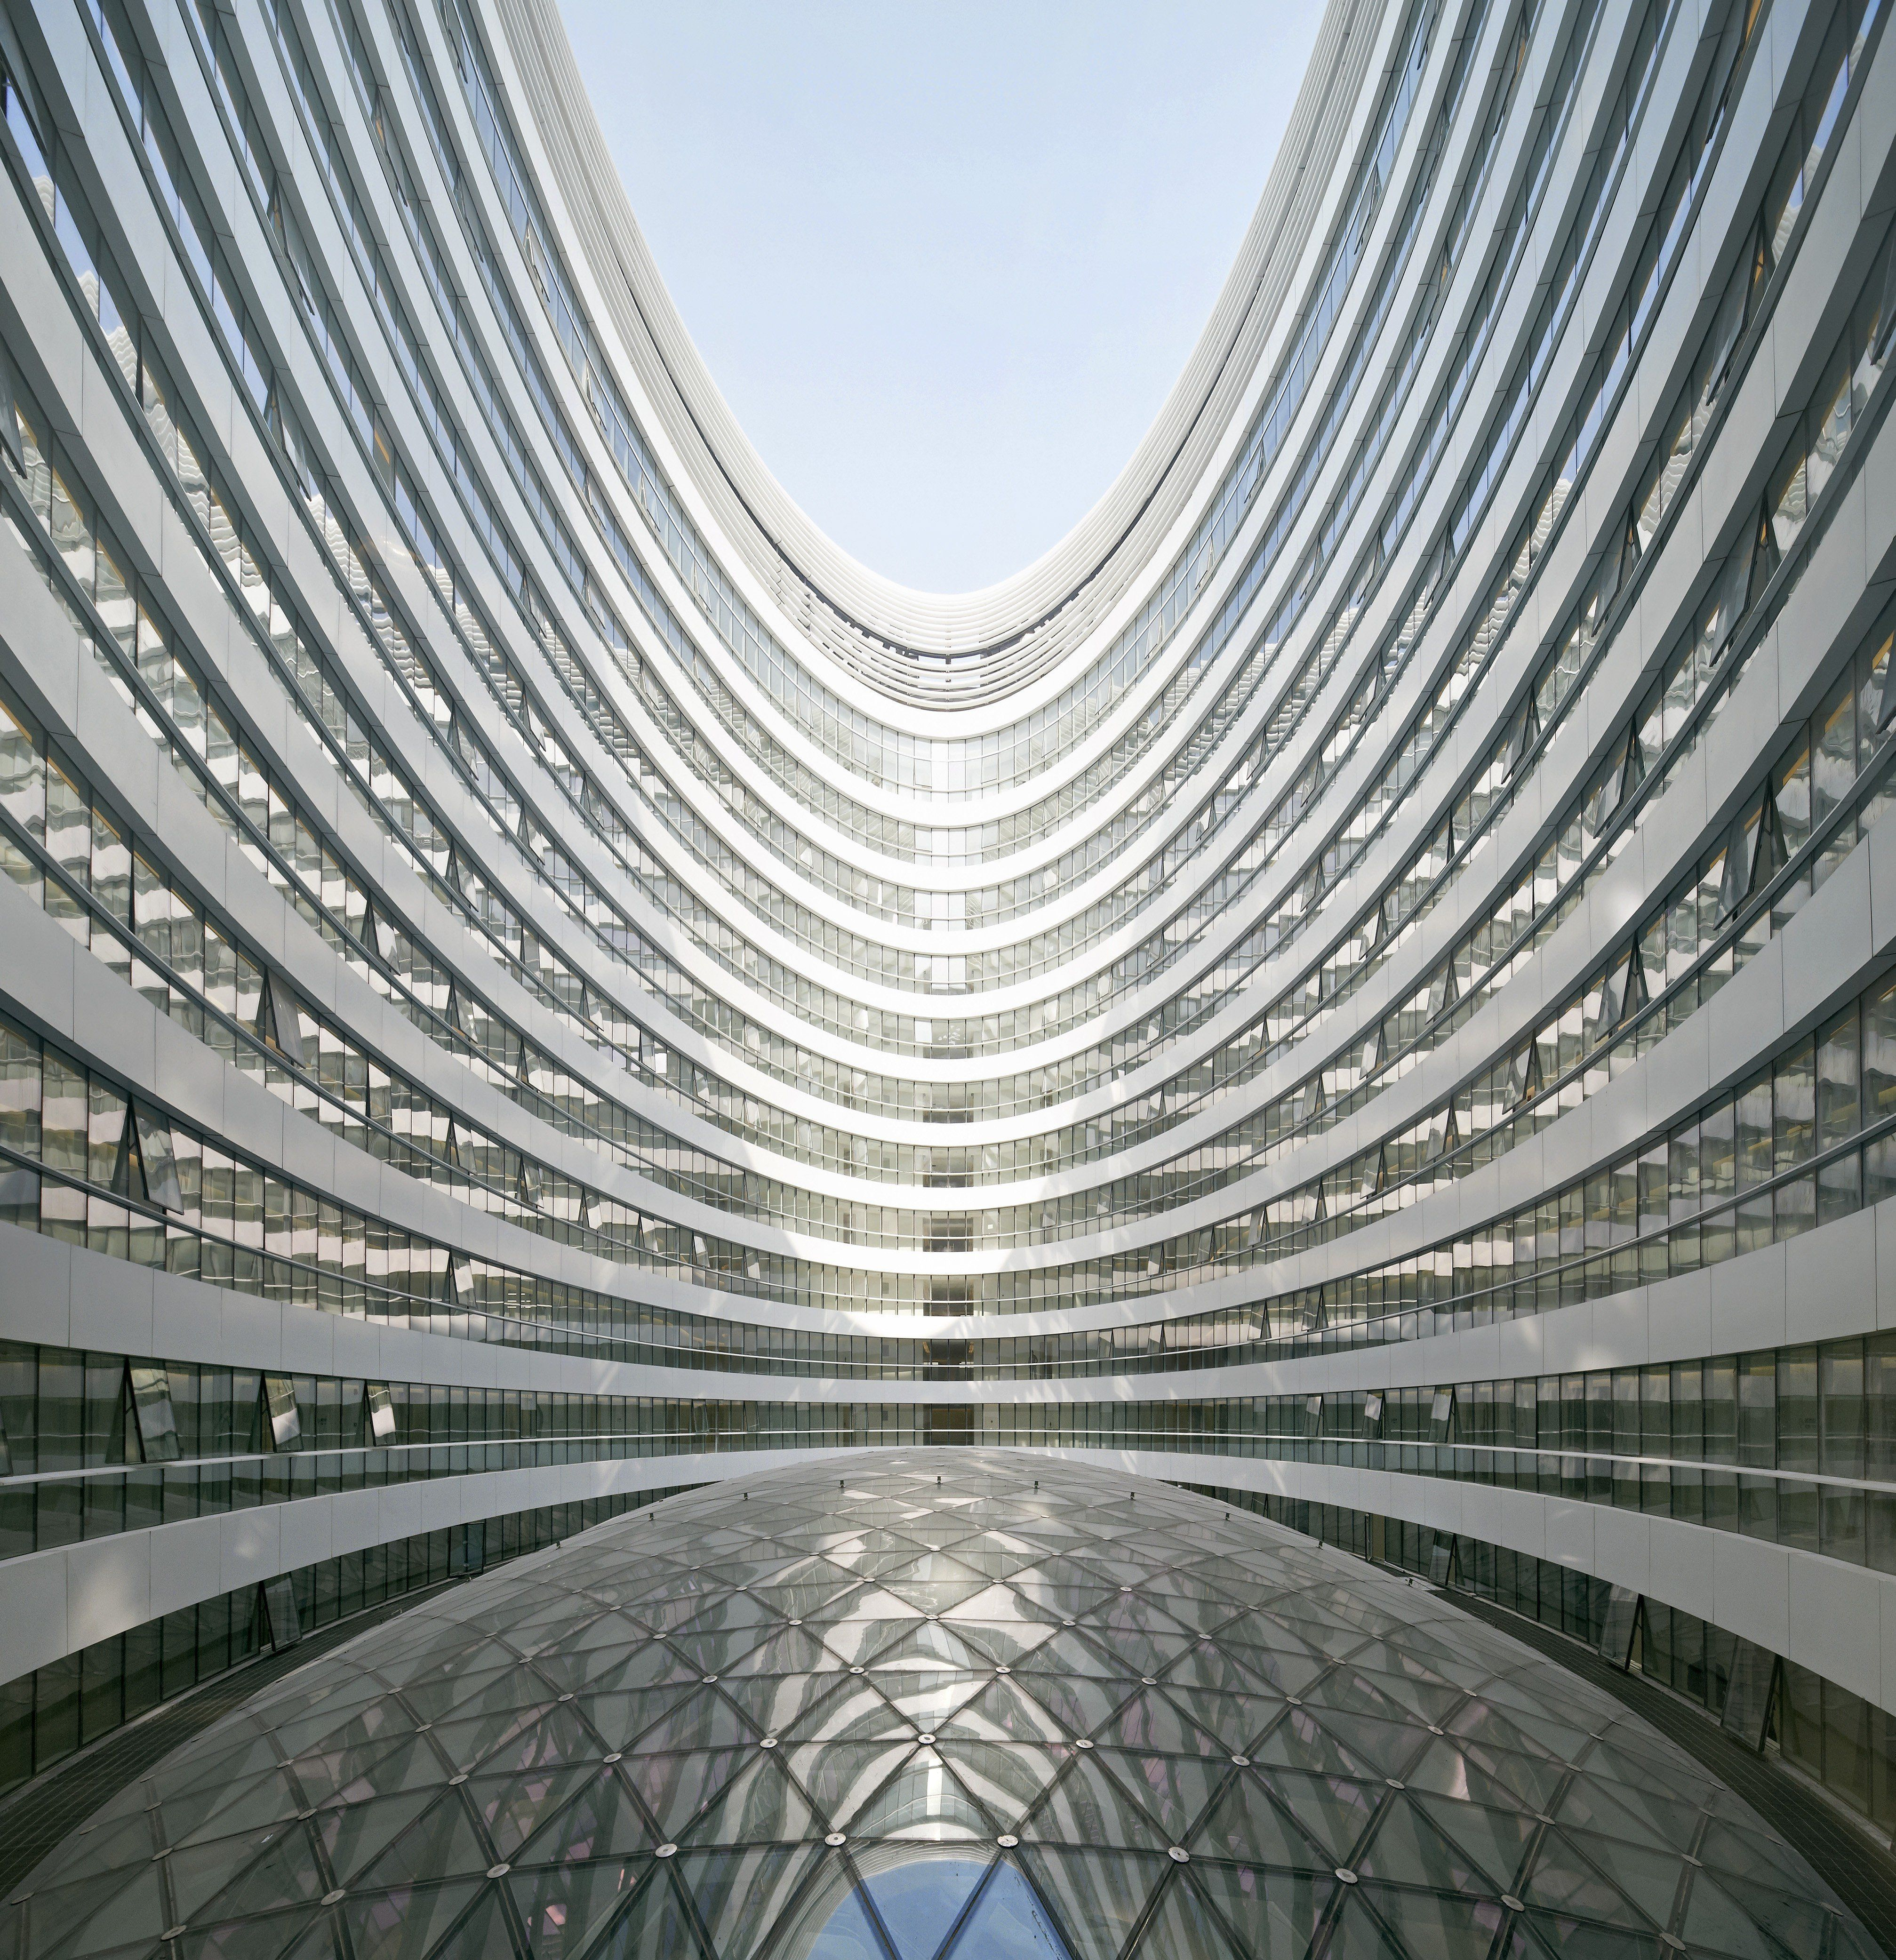 Wide angle view of atrium with glazed skylight, Galaxy Soho, Beijing, China, Architect: Zaha Hadid Architects, 2012.